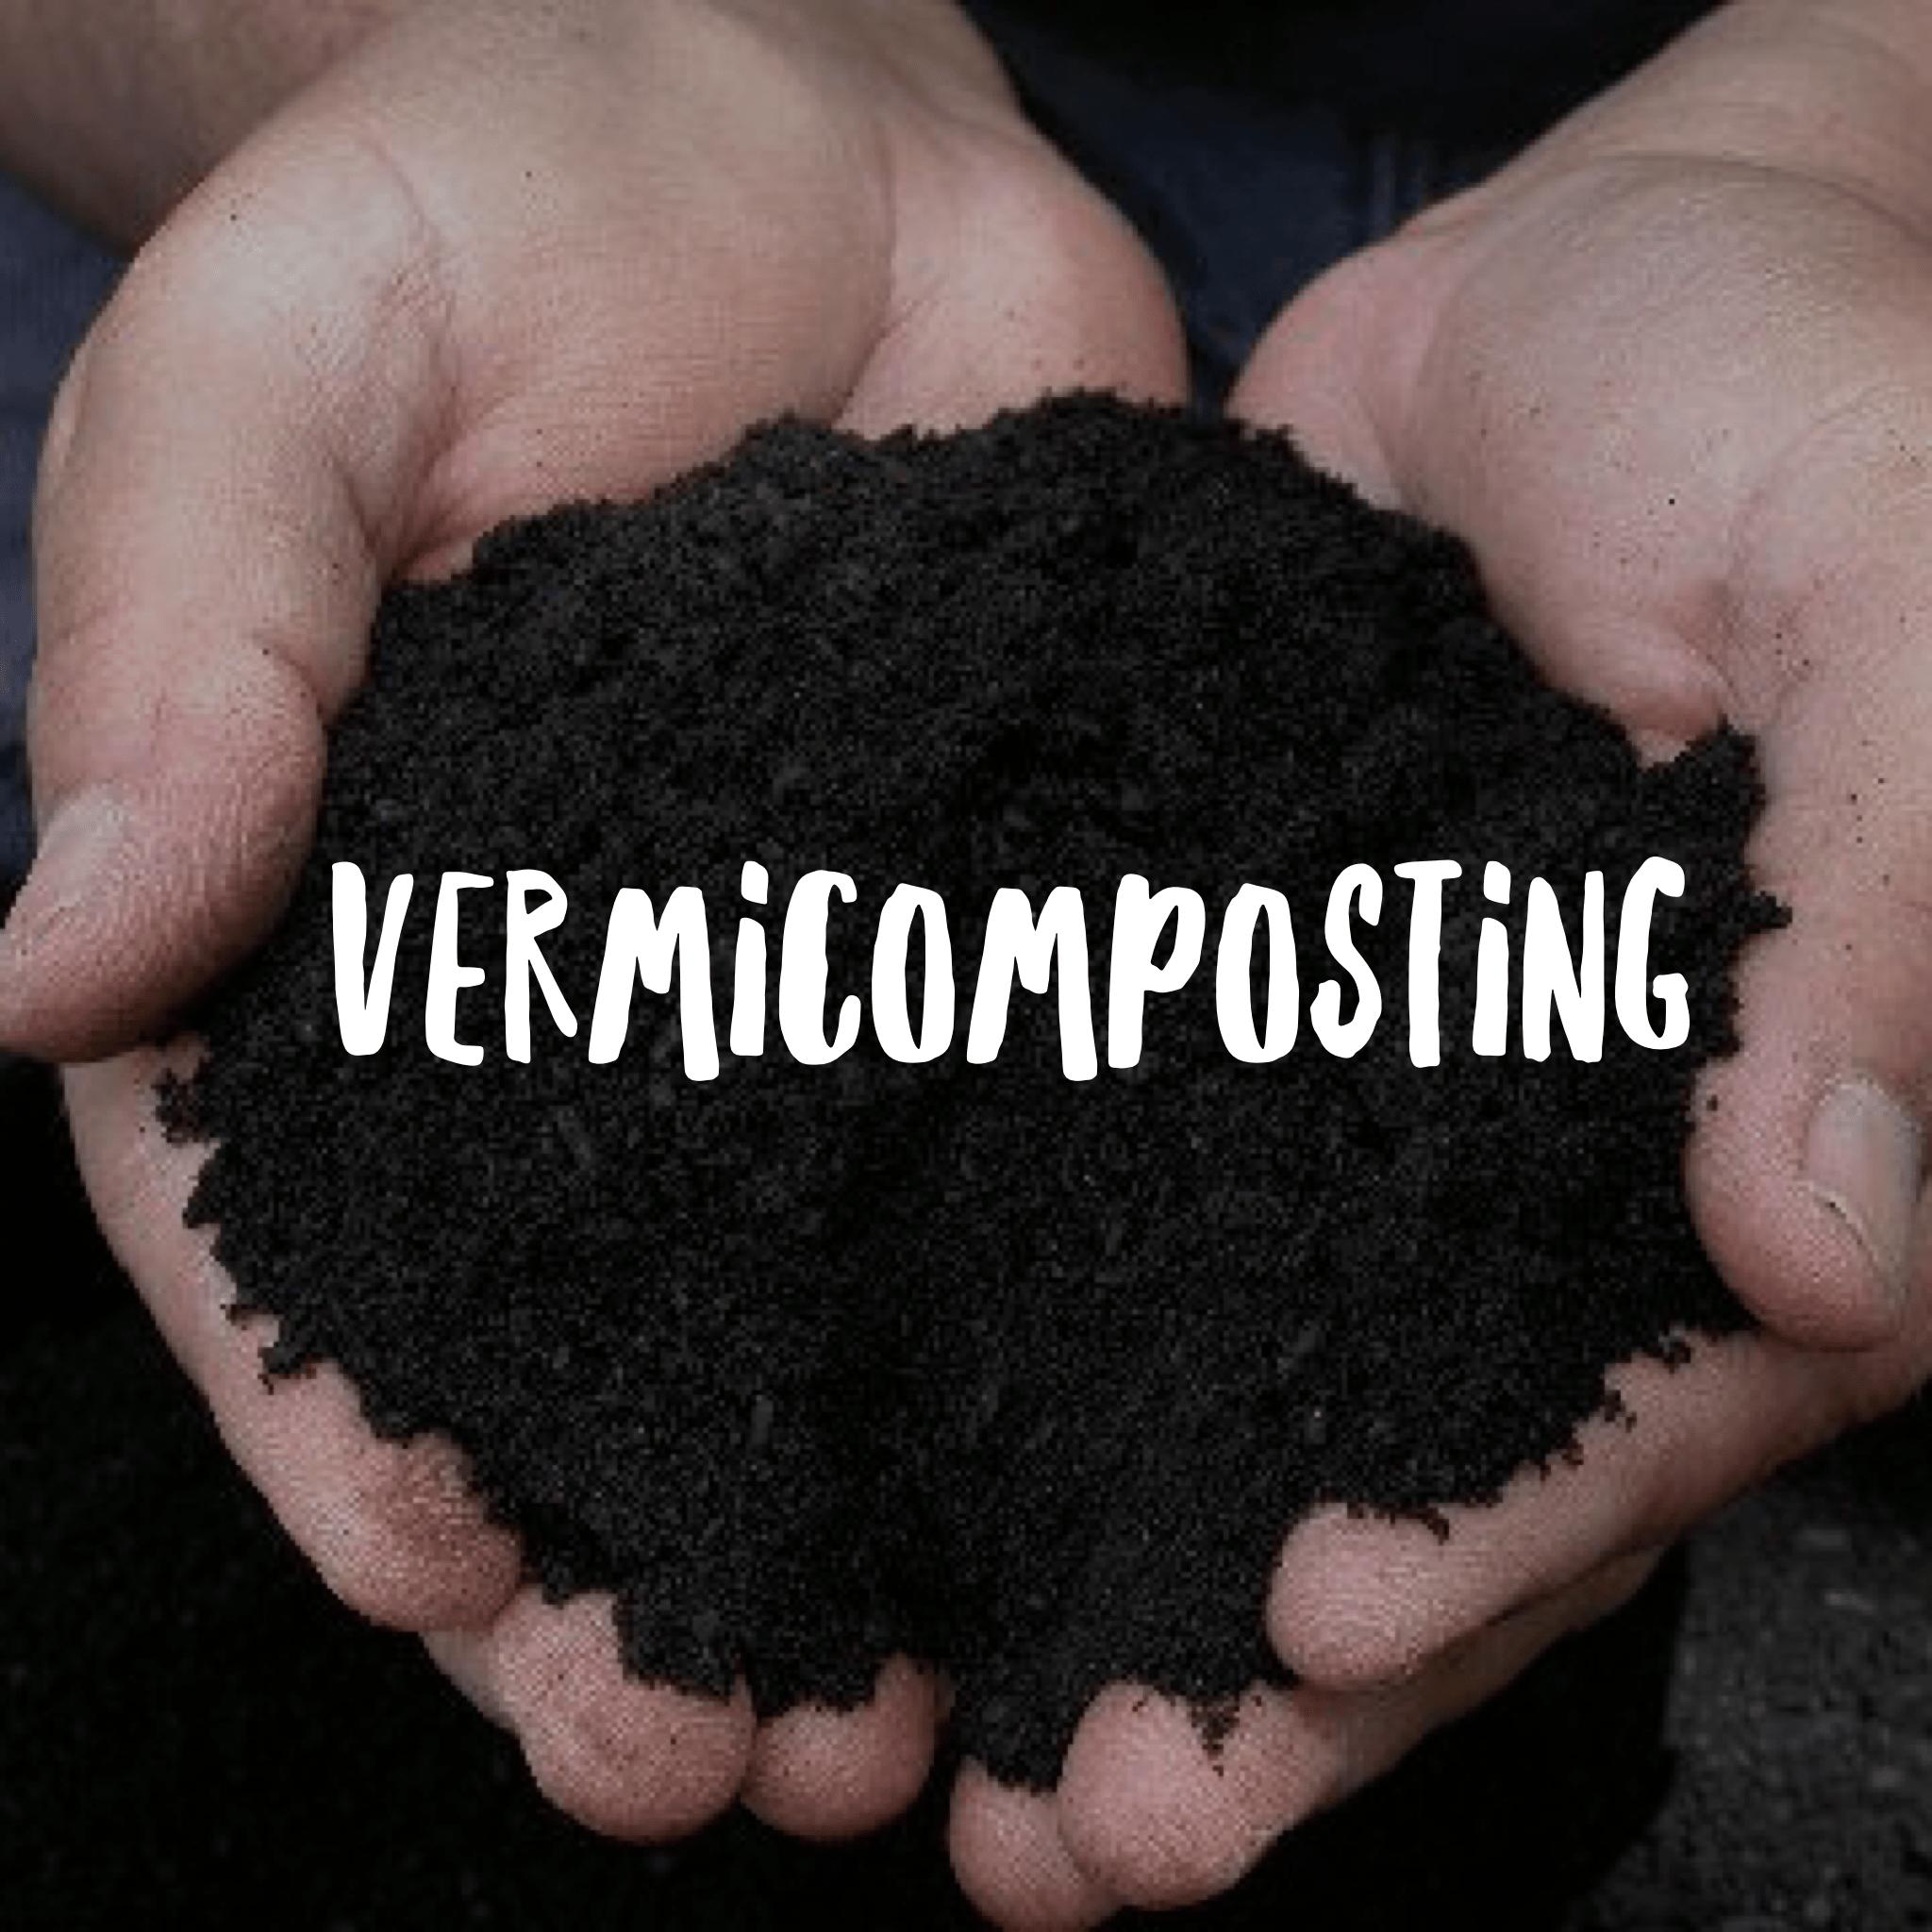 vermicomposting.png